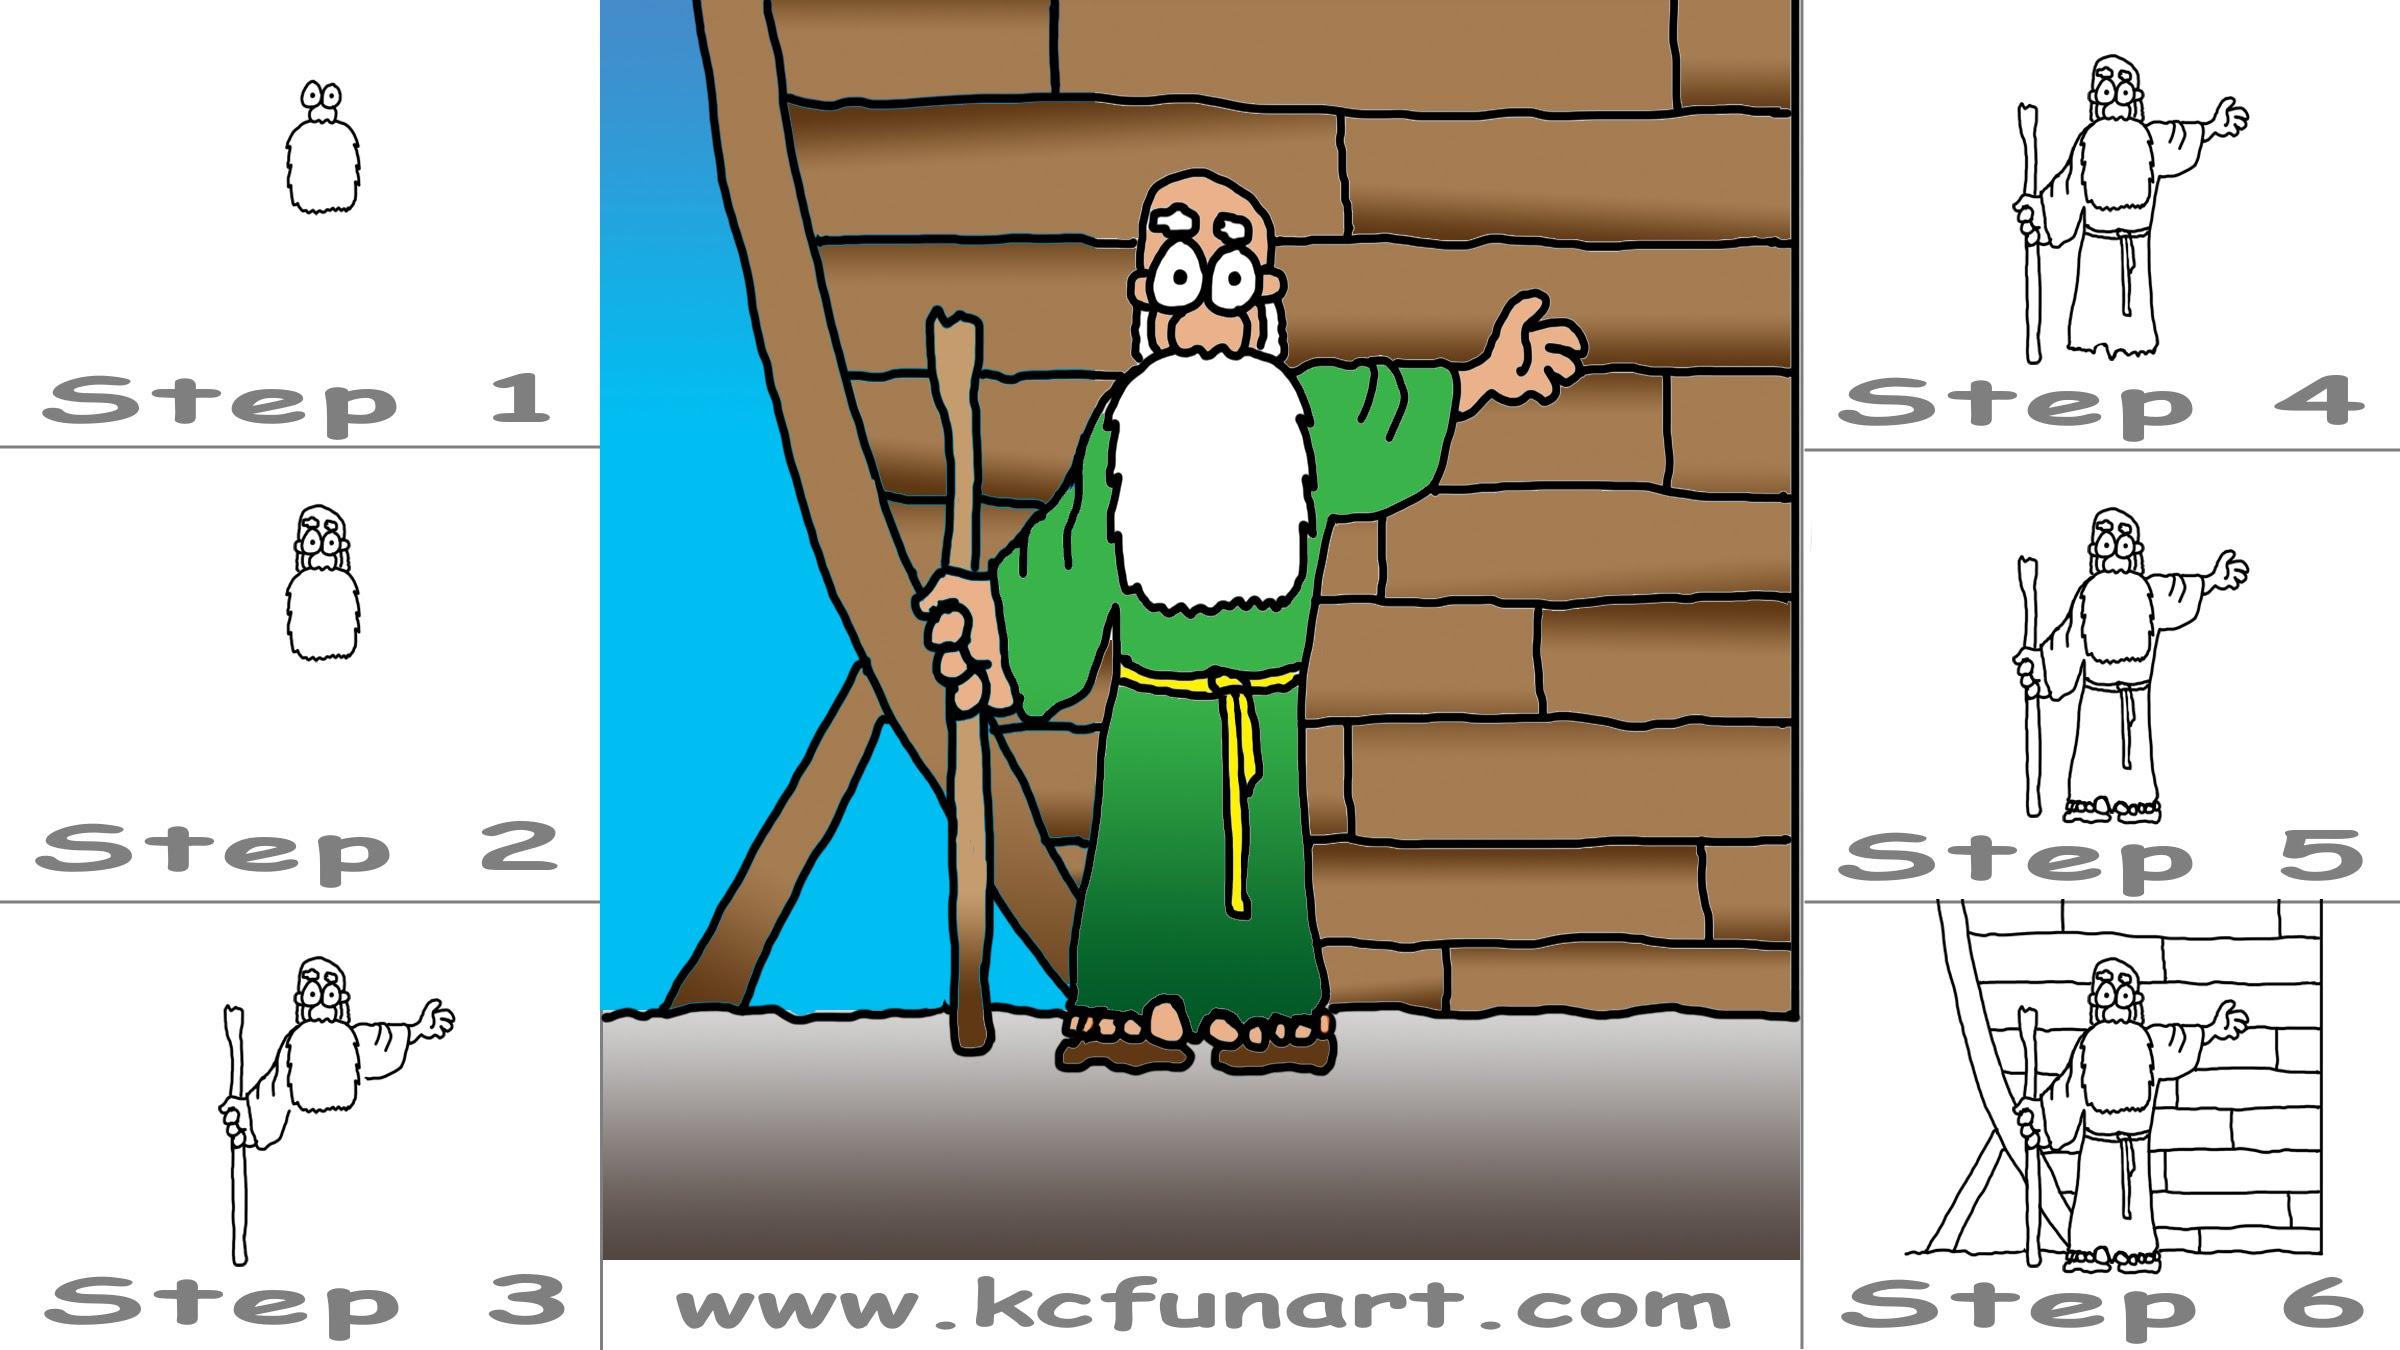 2400x1350 82 How To Draw A Cartoon Noah